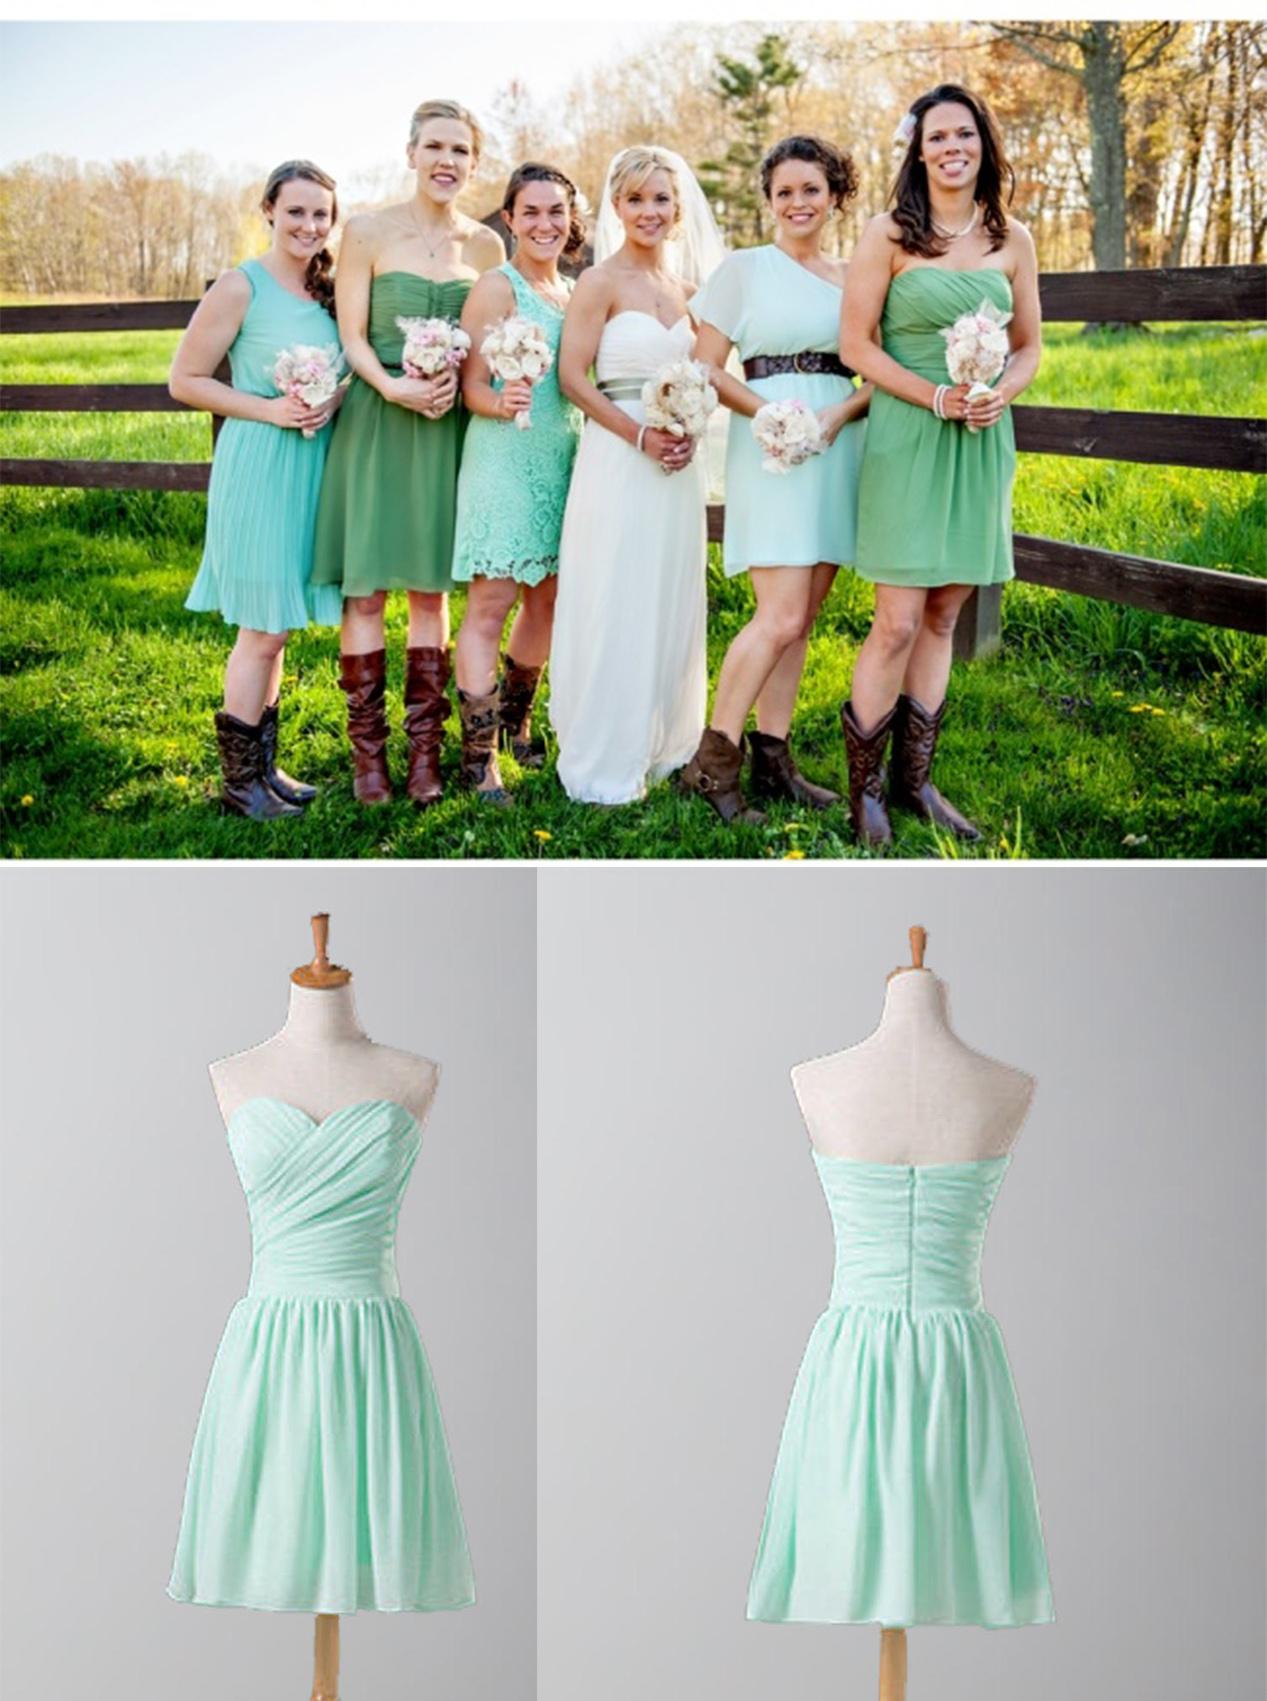 best shabby chic wedding inspirations country chic wedding dresses shabby chic green bridesmaid dress UK